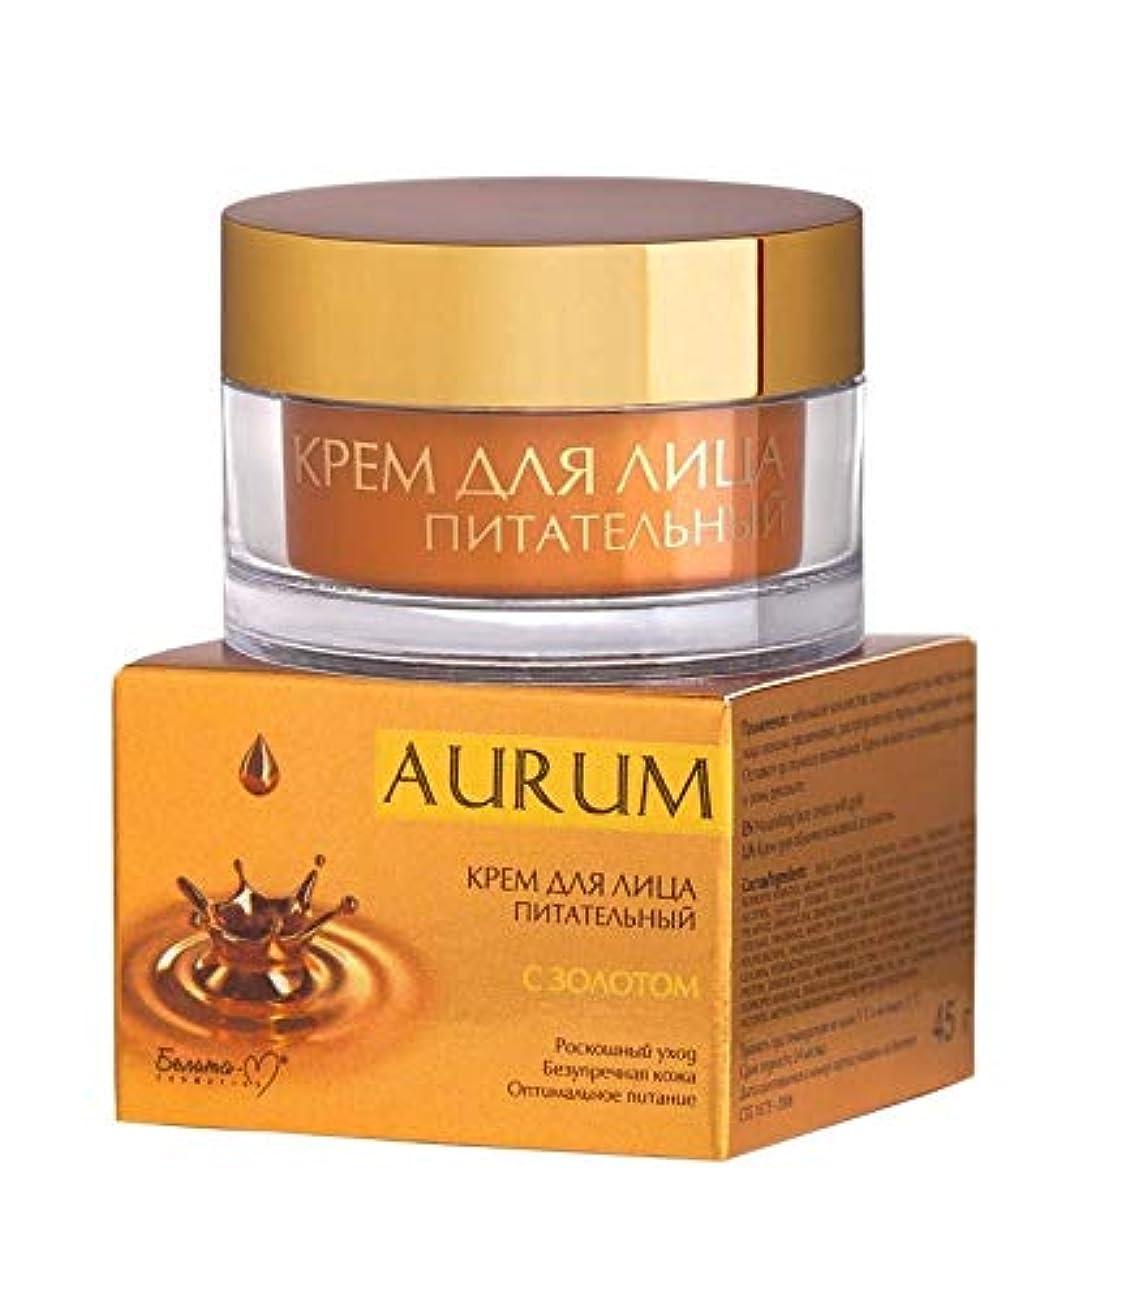 Bielita & Vitex | NUTRITIONAL FACE CREAM WITH GOLD | AURUM | Luxury care | Flawless skin | Optimal nutrition |...